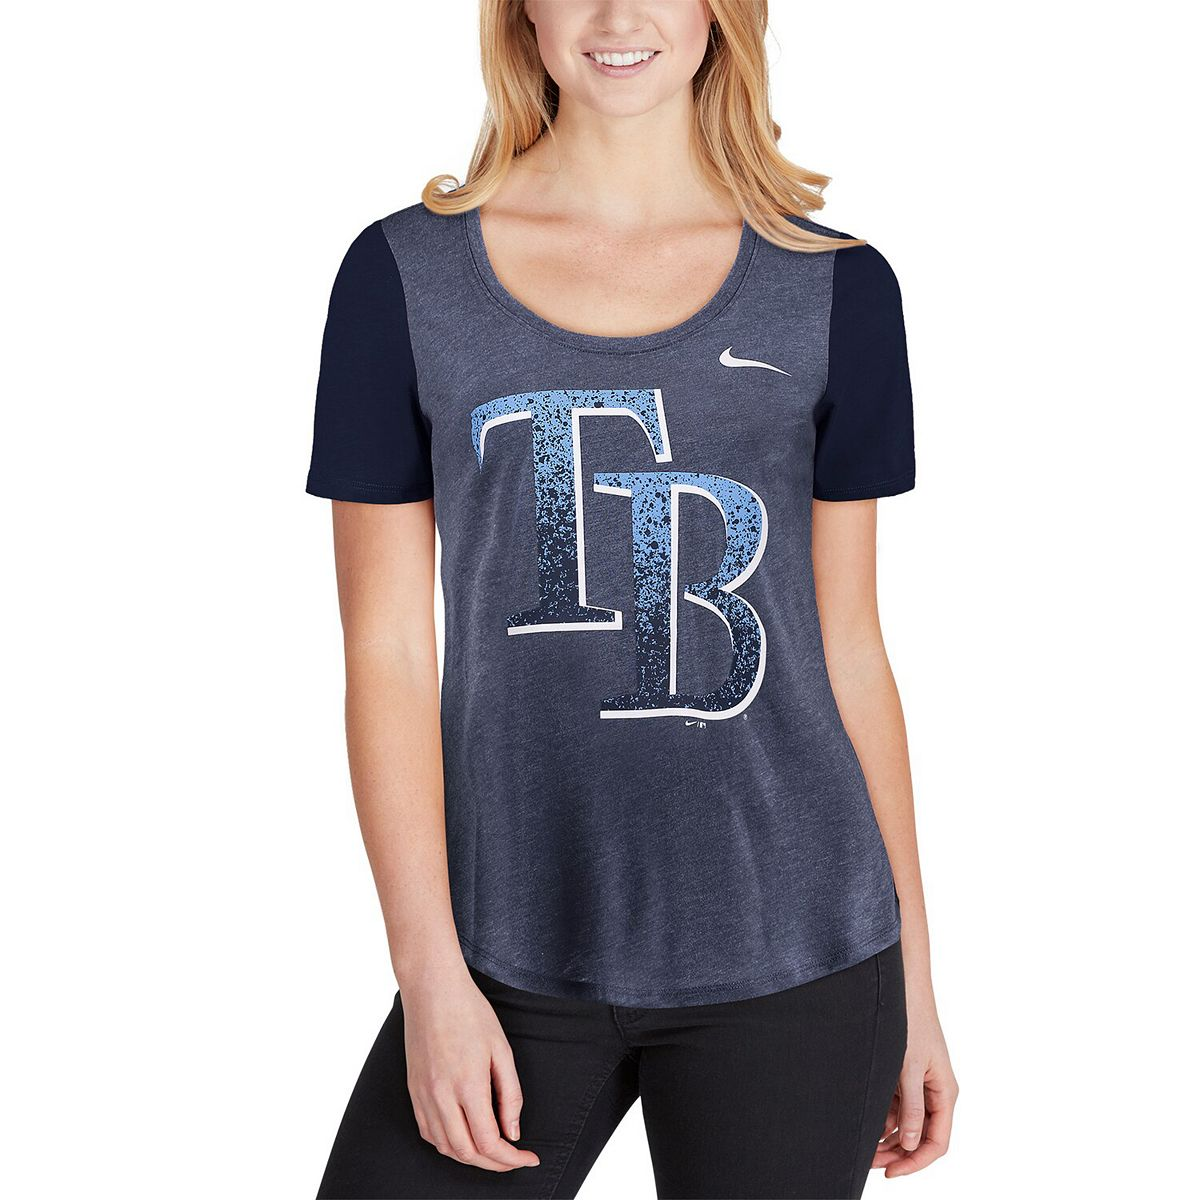 Women's Nike Navy Tampa Bay Rays Tri-Blend Scoop Neck T-Shirt OwamS